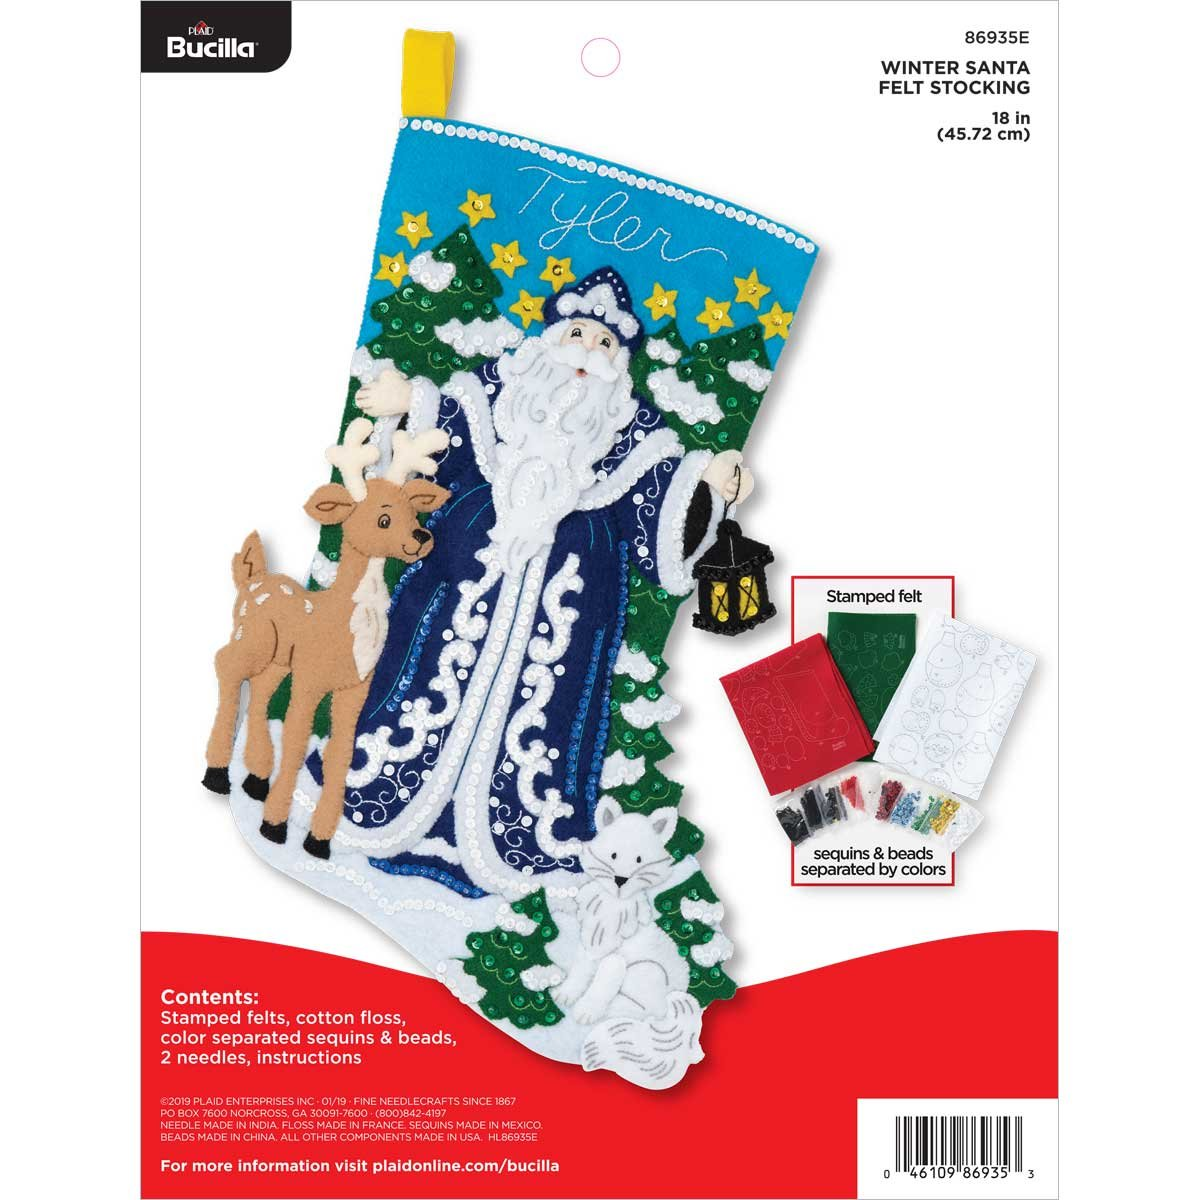 Bucilla Winter Santa Stocking Kit